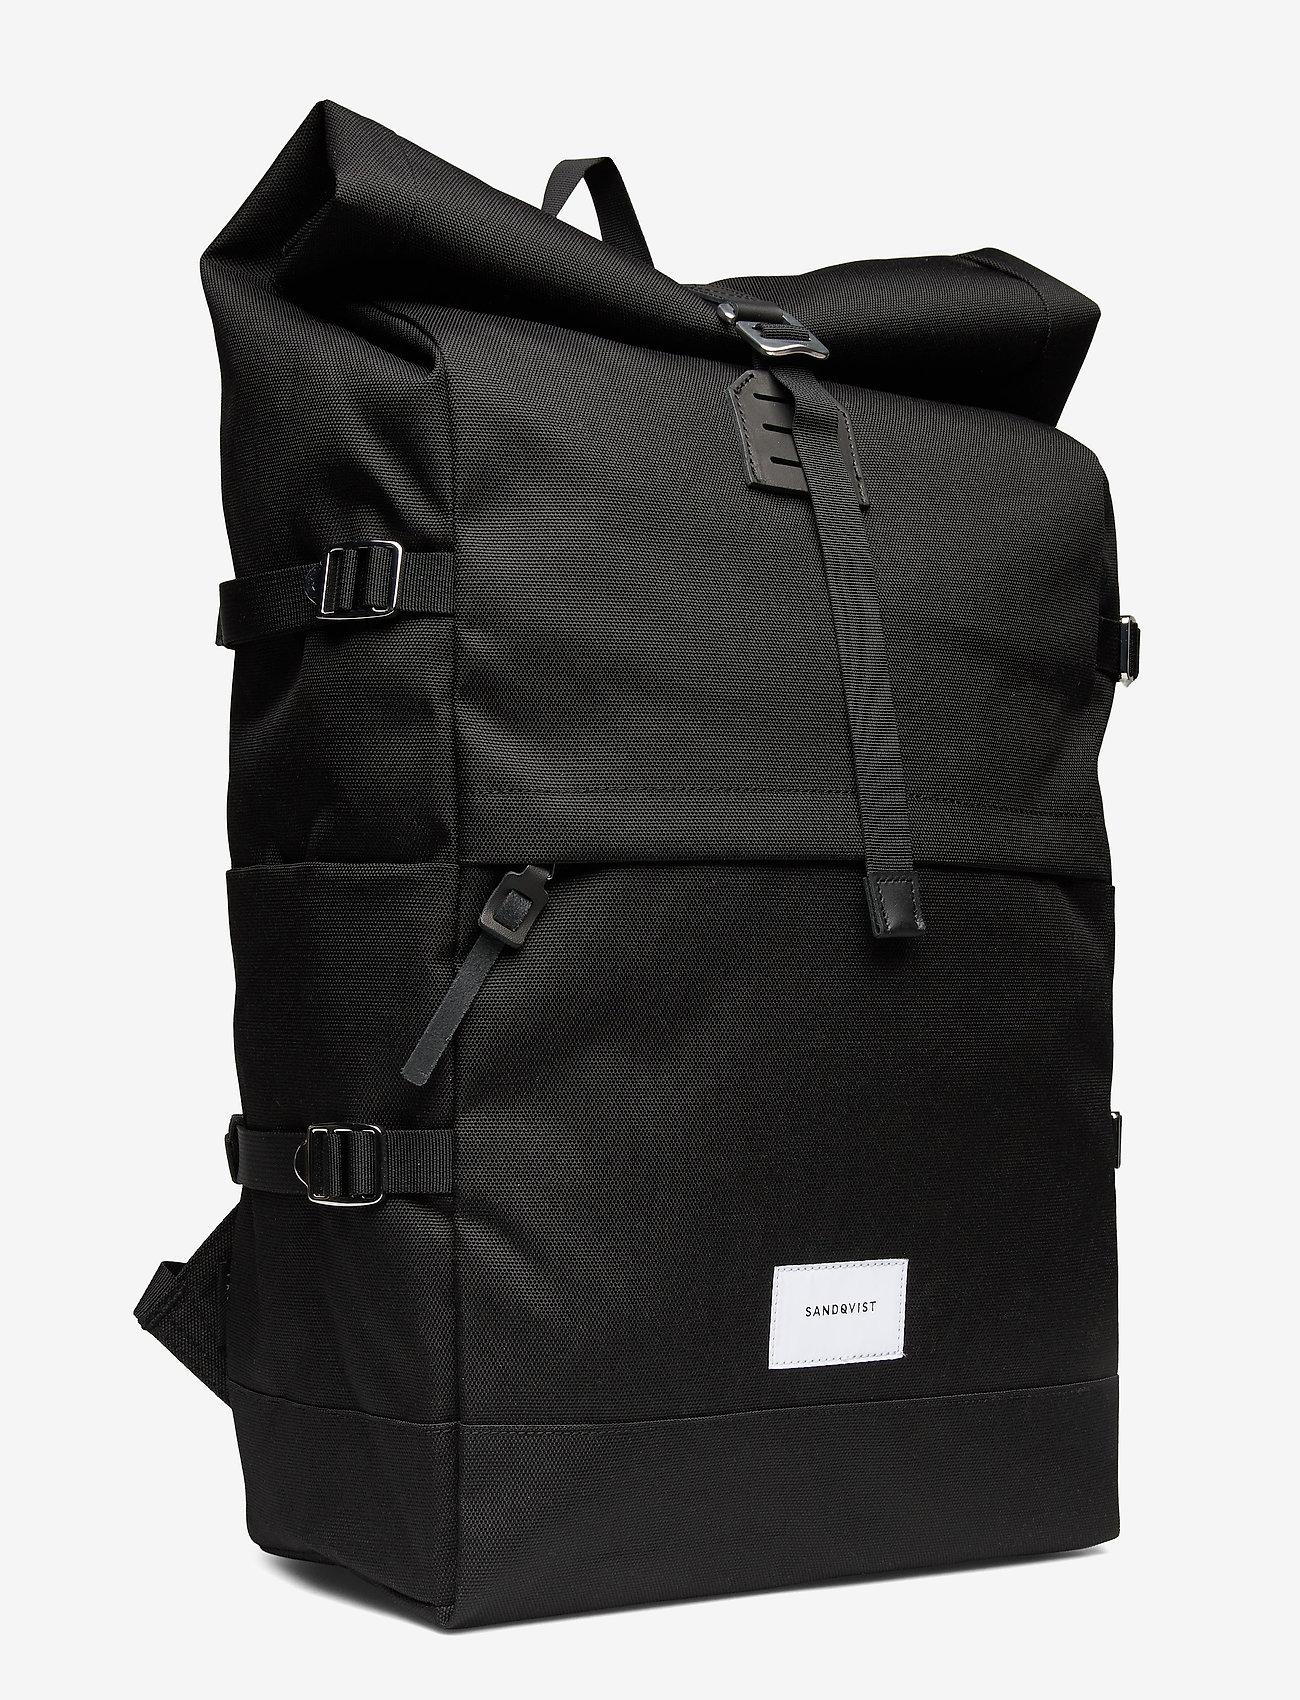 SANDQVIST - BERNT - nieuwe mode - black - 3